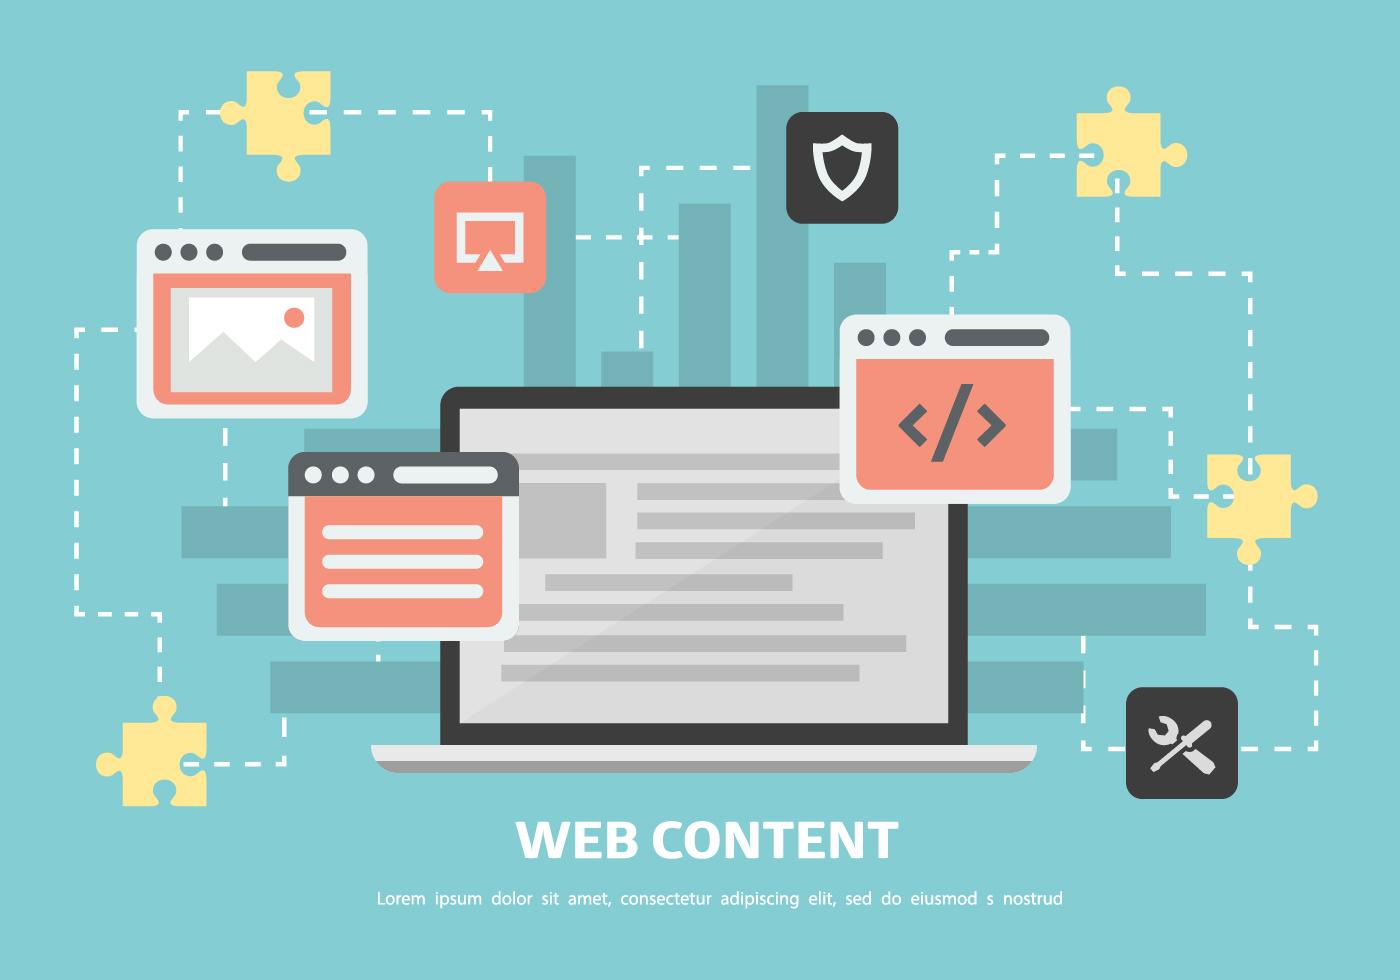 Vector Illustration Web Designs: Free Web Content Vector Background